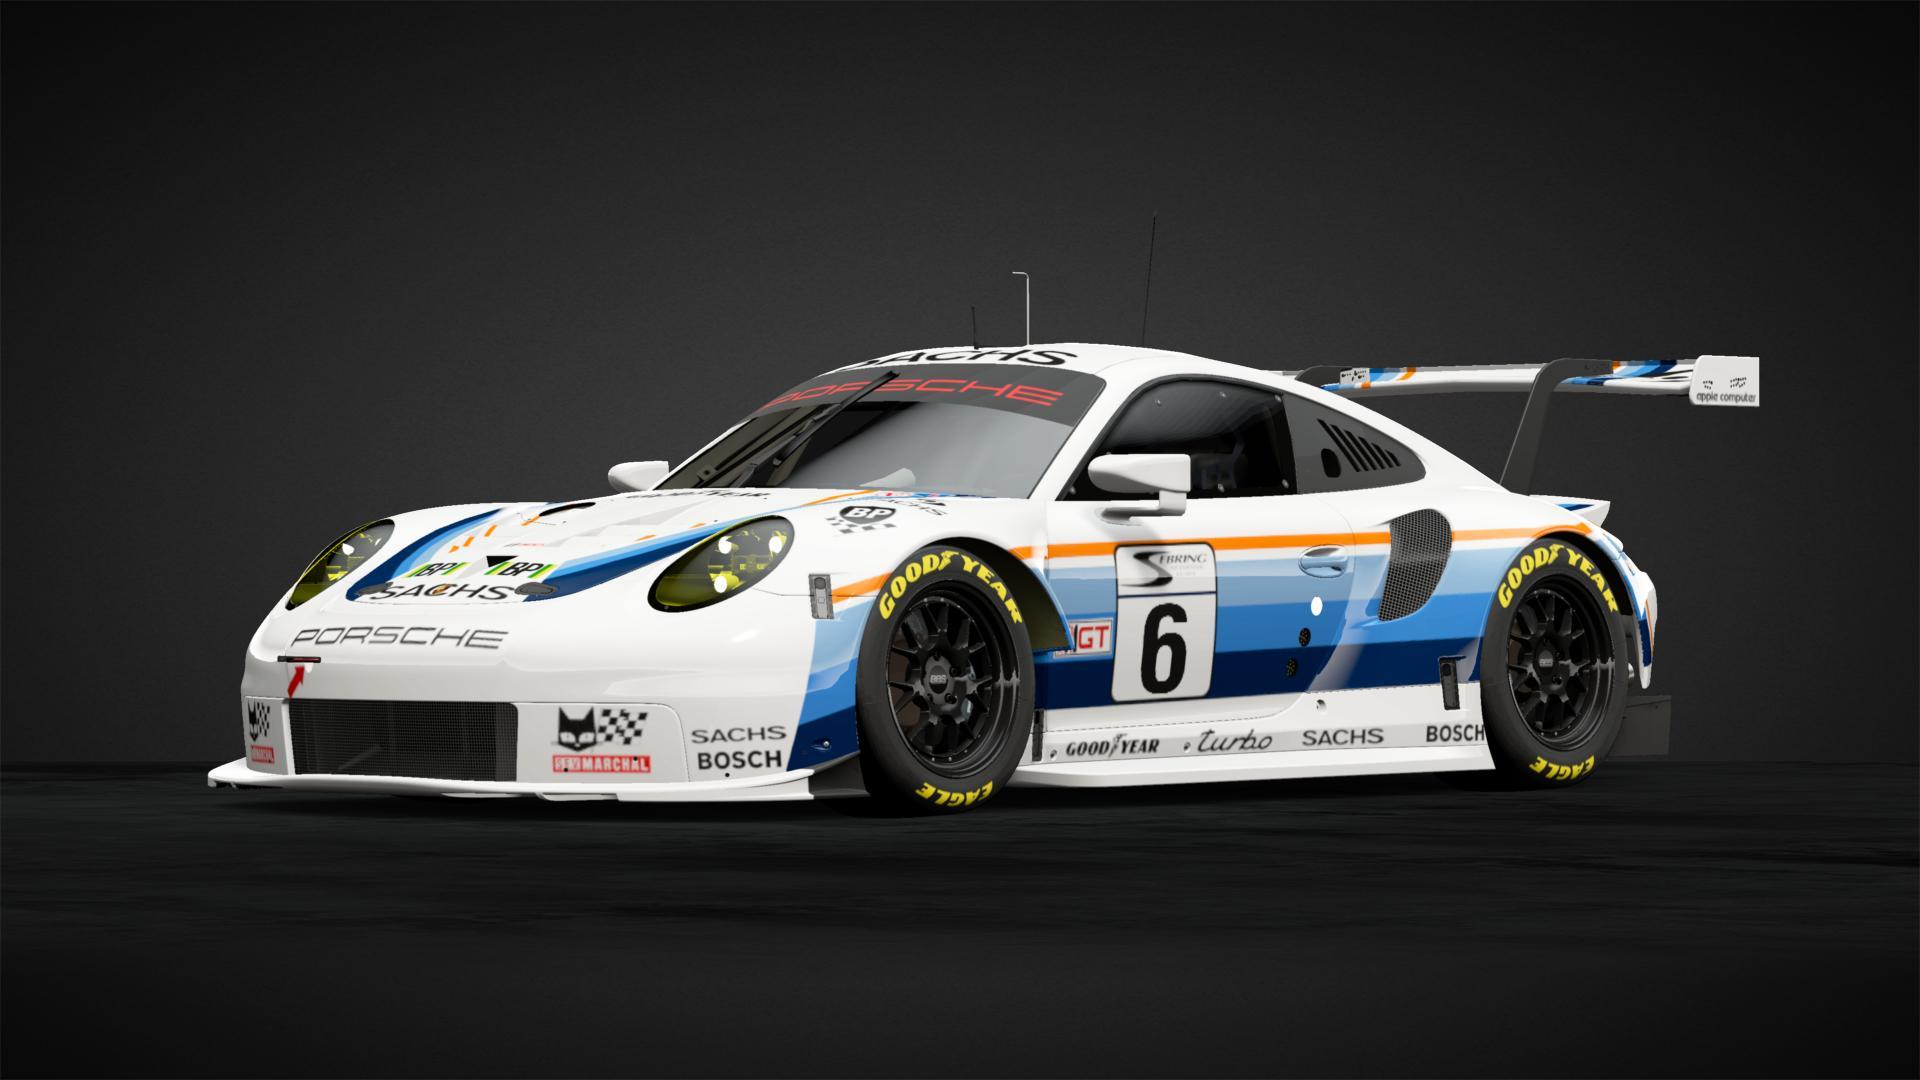 SACHS Porsche RSR Replica Car Livery by xCOLOMB1ANx